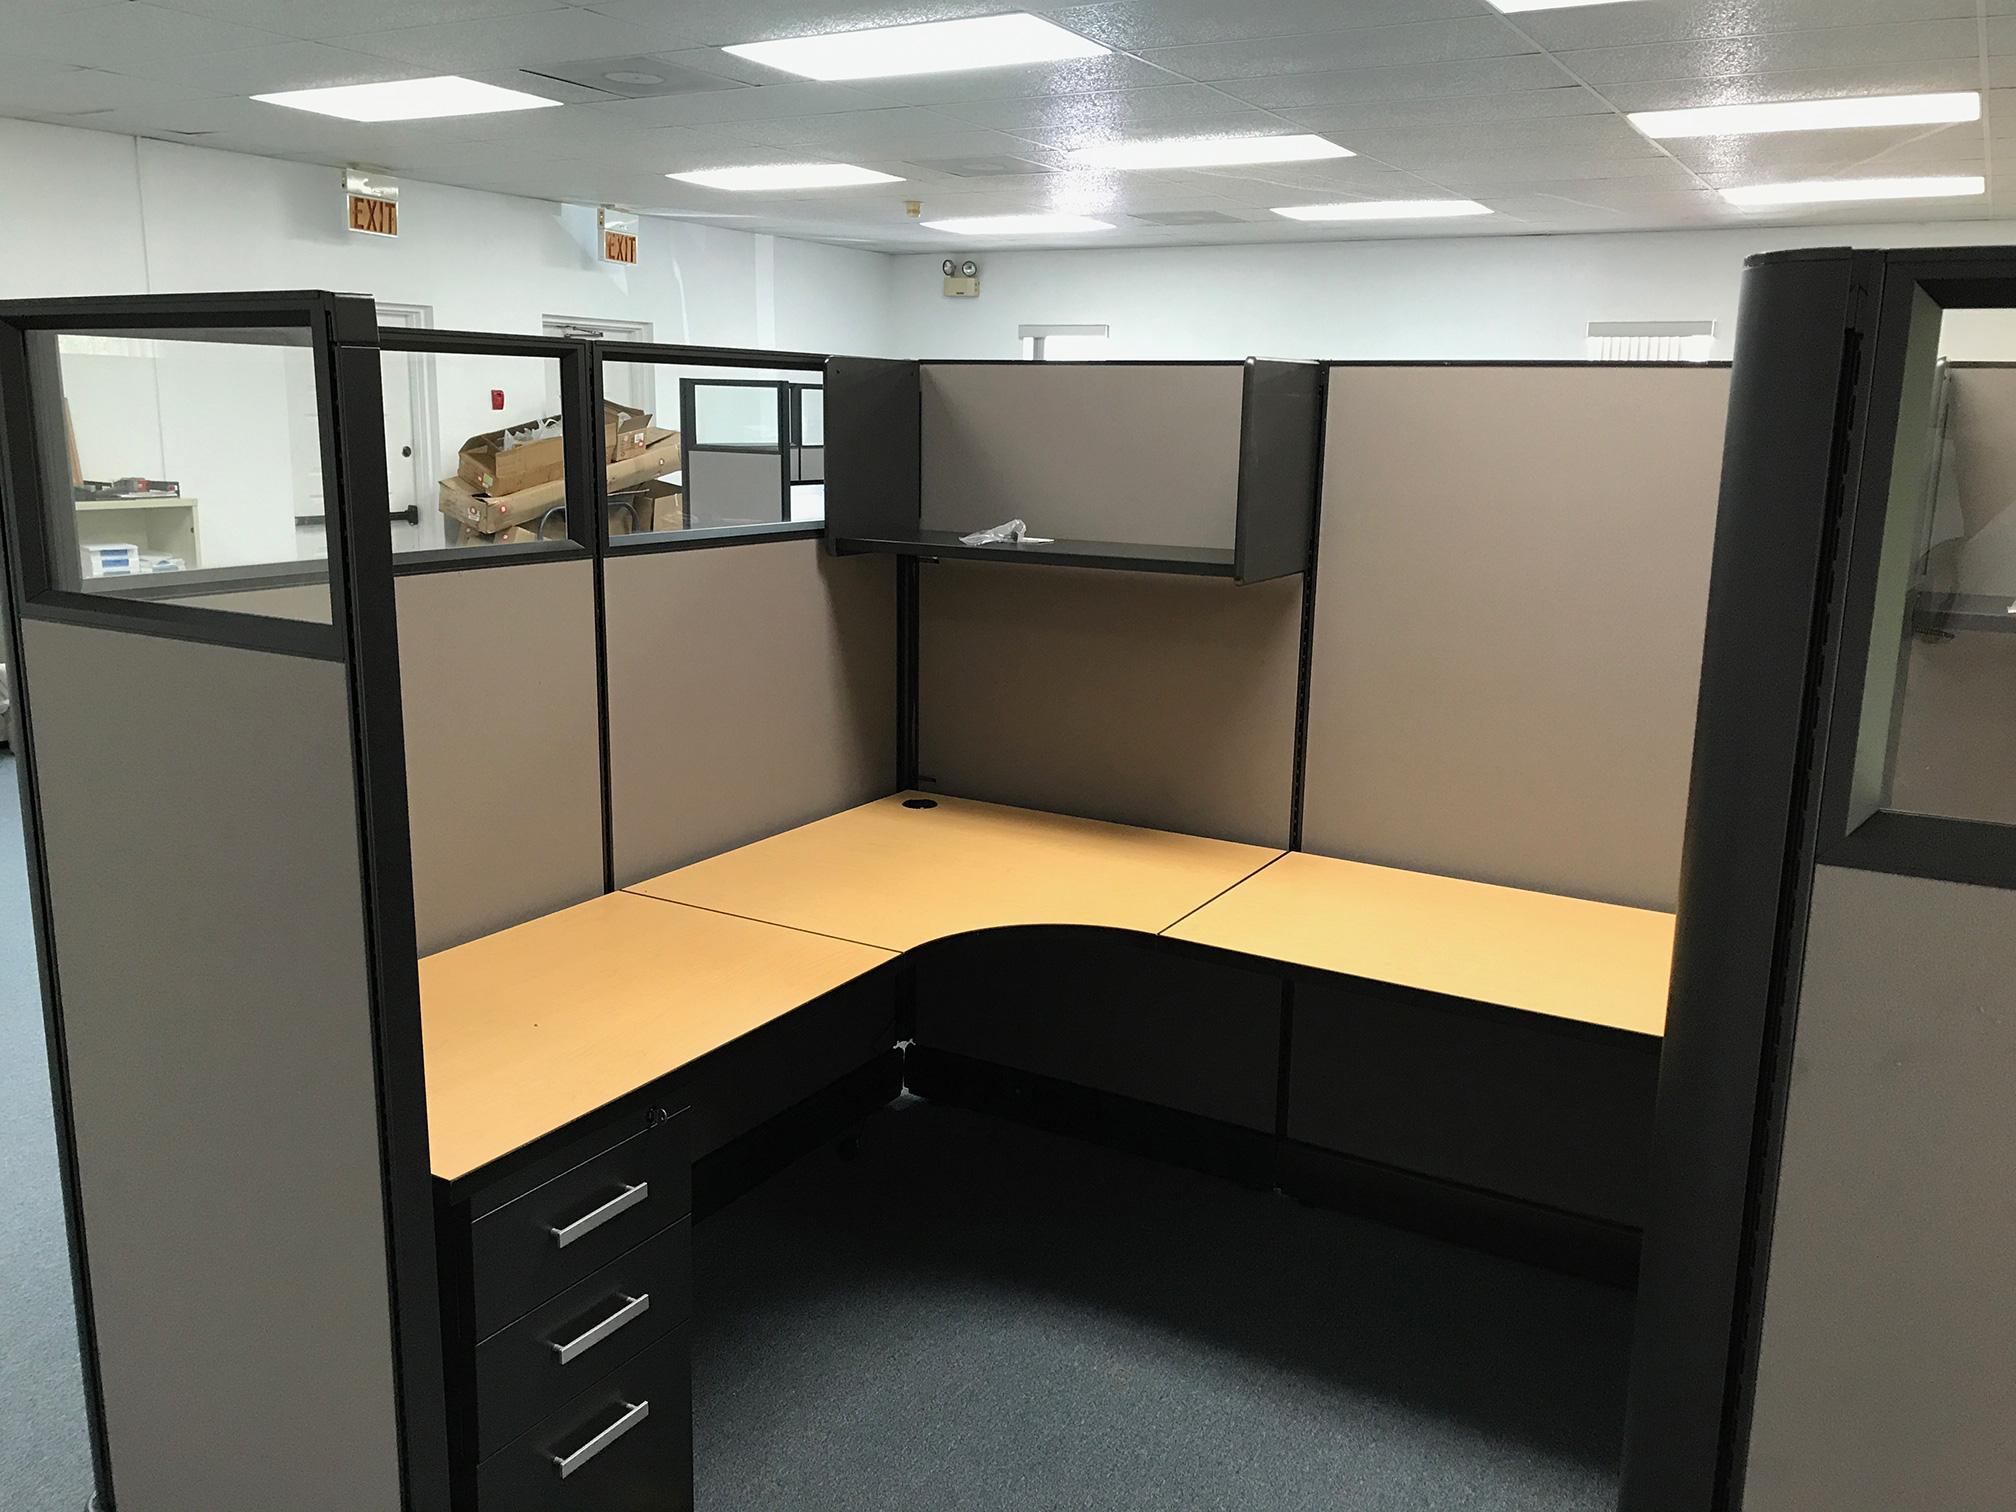 friant-office-furniture-manasota-office-supplies-llc.jpg